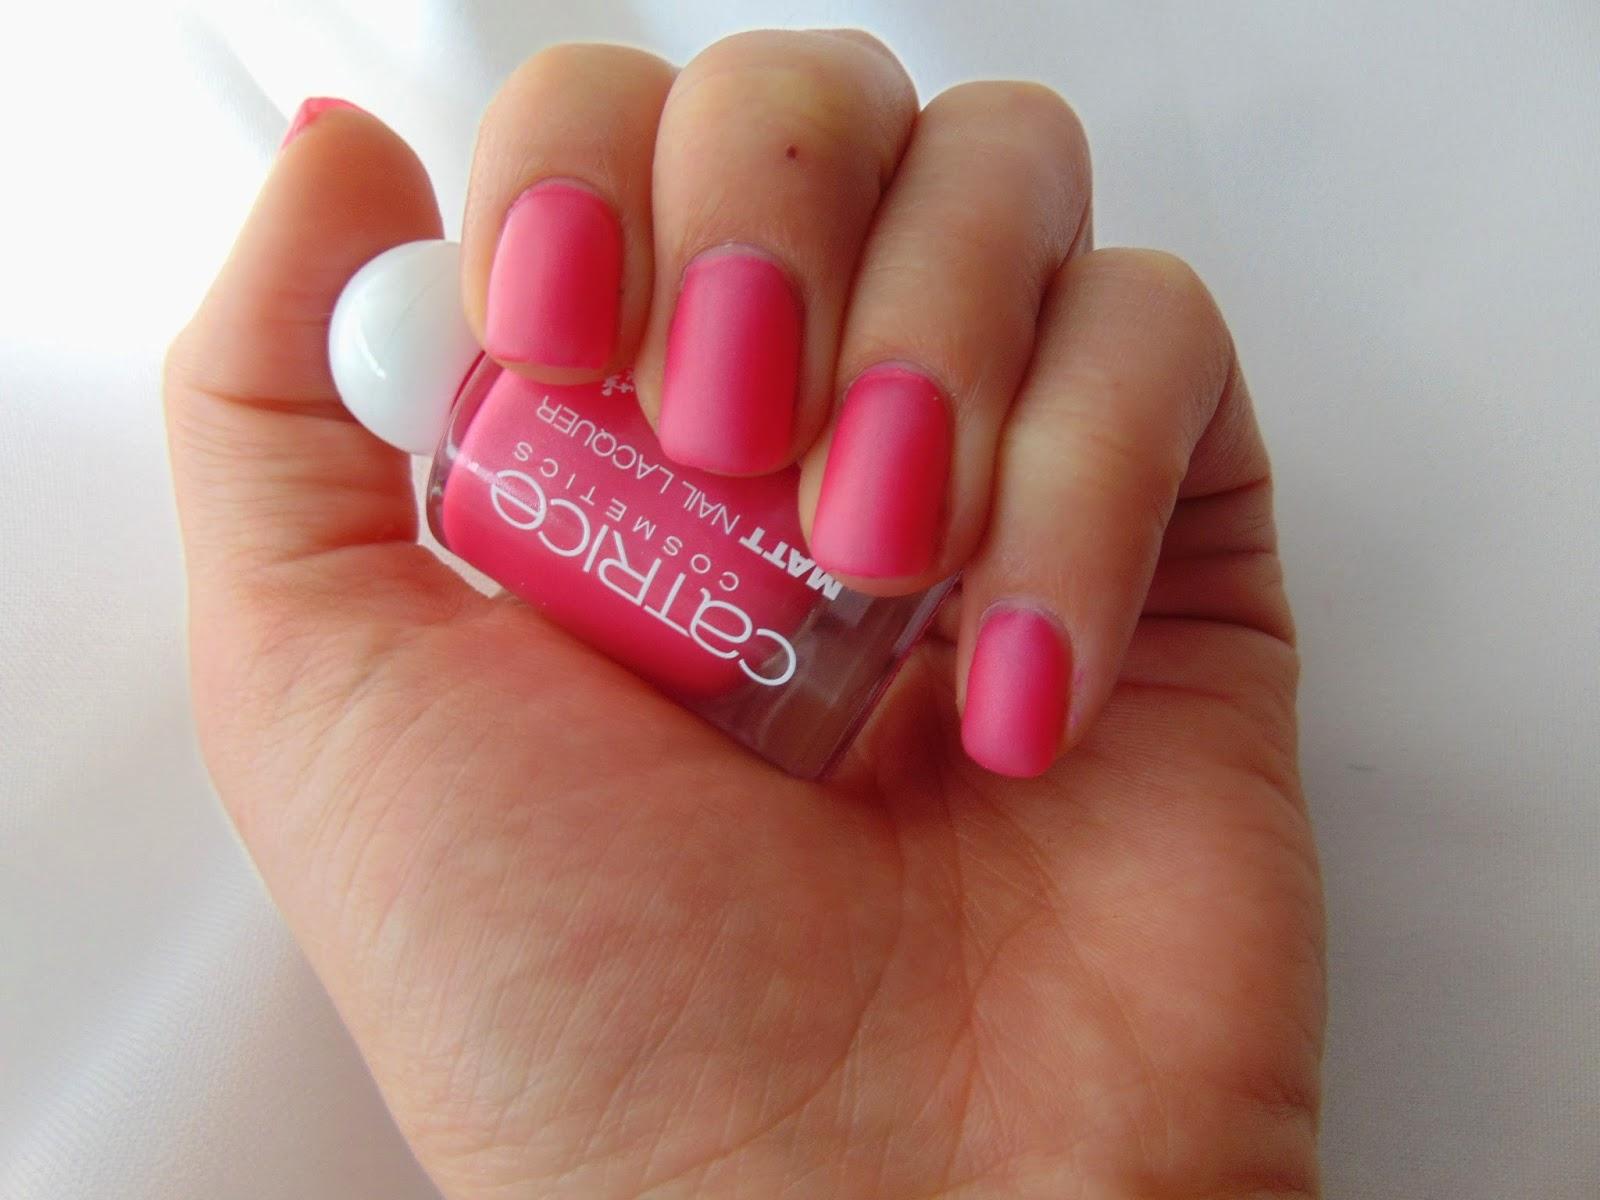 Catrice LE - Rock-O-CO - Matt Nail Lacquer Madame De Pinkadour on Nails - www.annitschkasblog.de